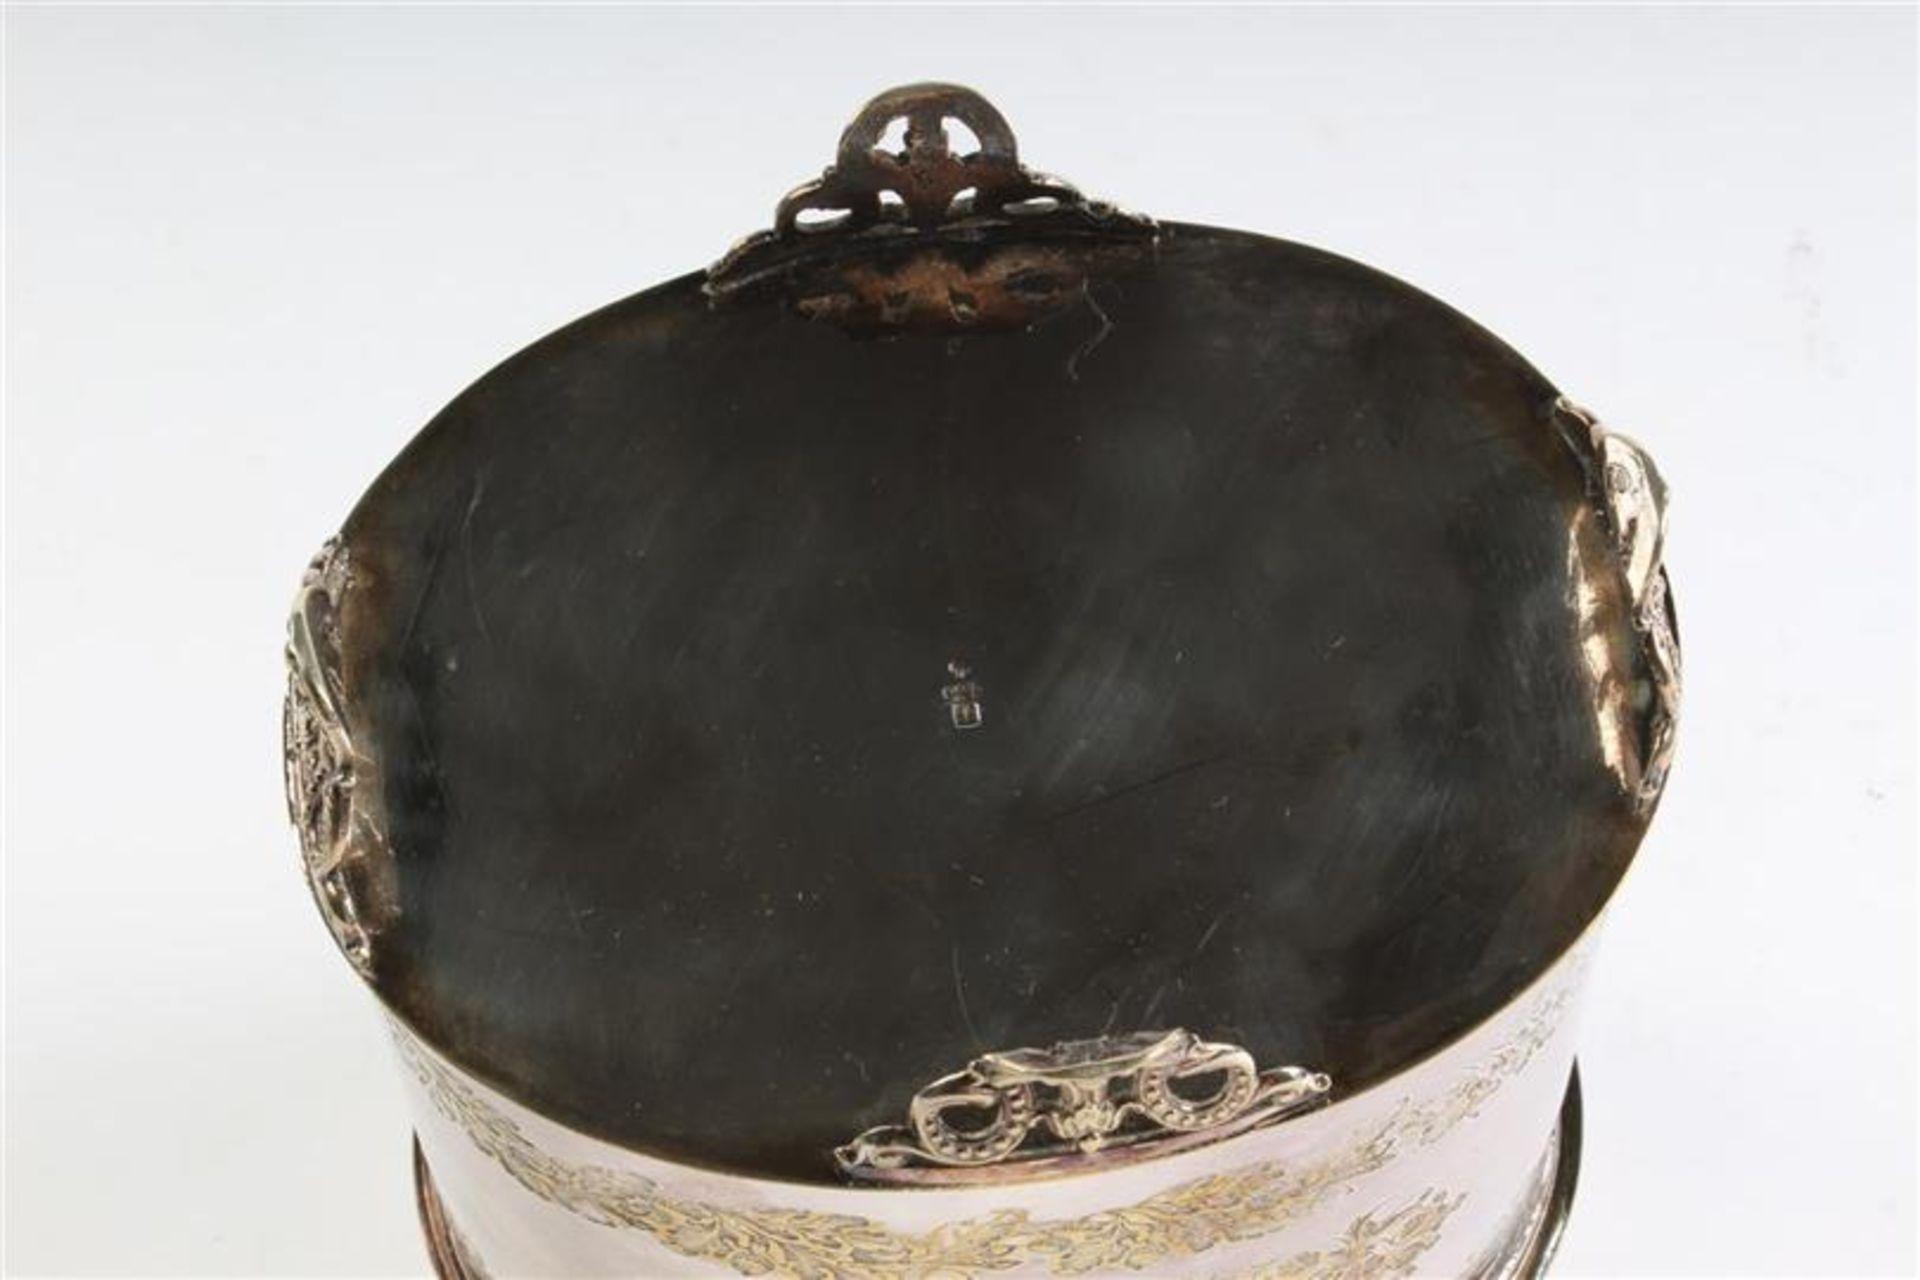 Los 1 - Verzilverde koektrommel, ovaal model op pootjes met guirlandes van eikenblad en medaillon